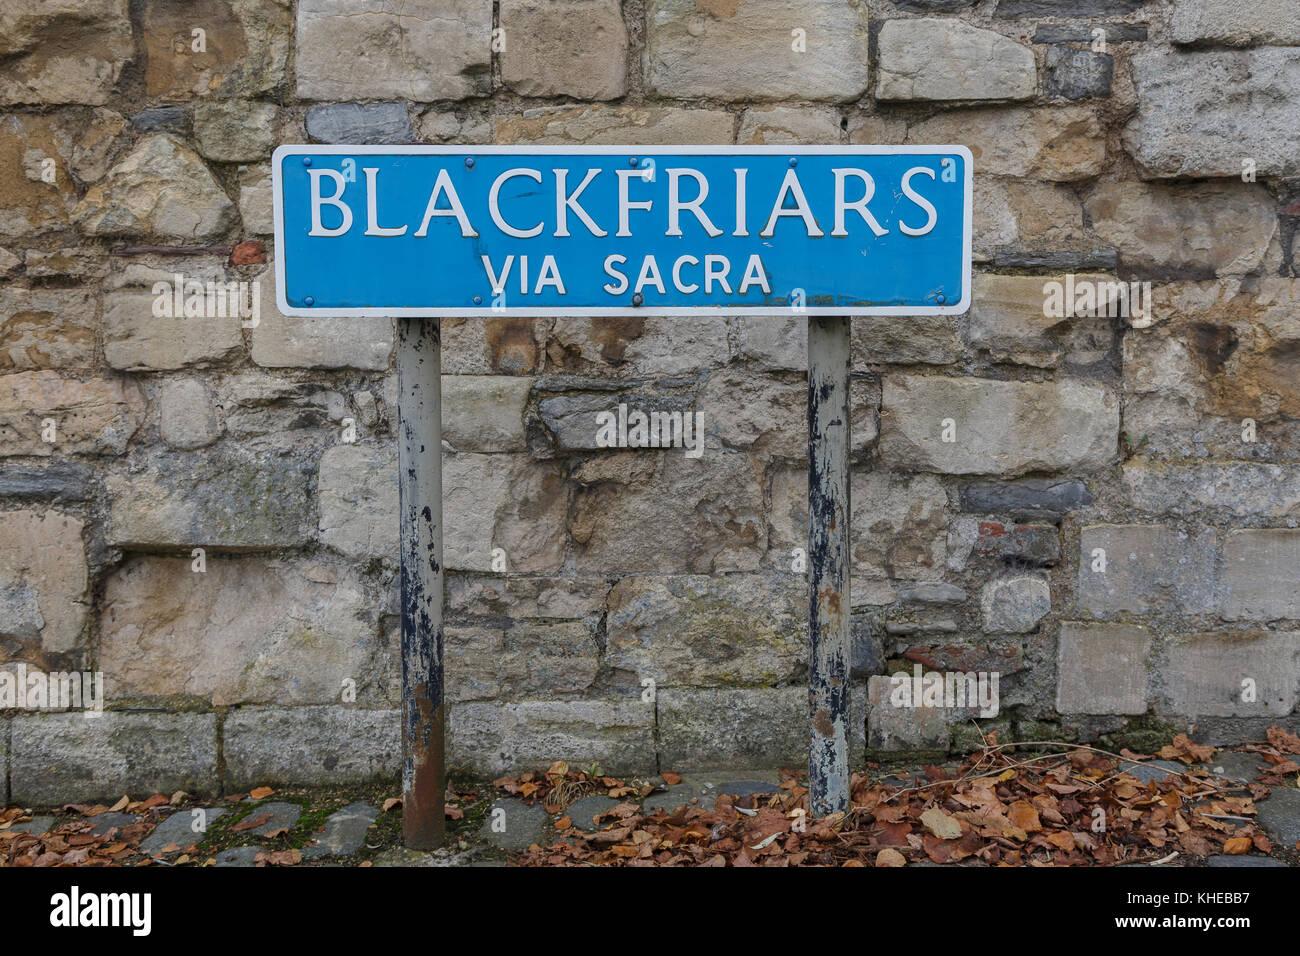 Road sign for Blackfriars, the Via Sacra, Gloucester, Gloucestershire, England, UK - Stock Image